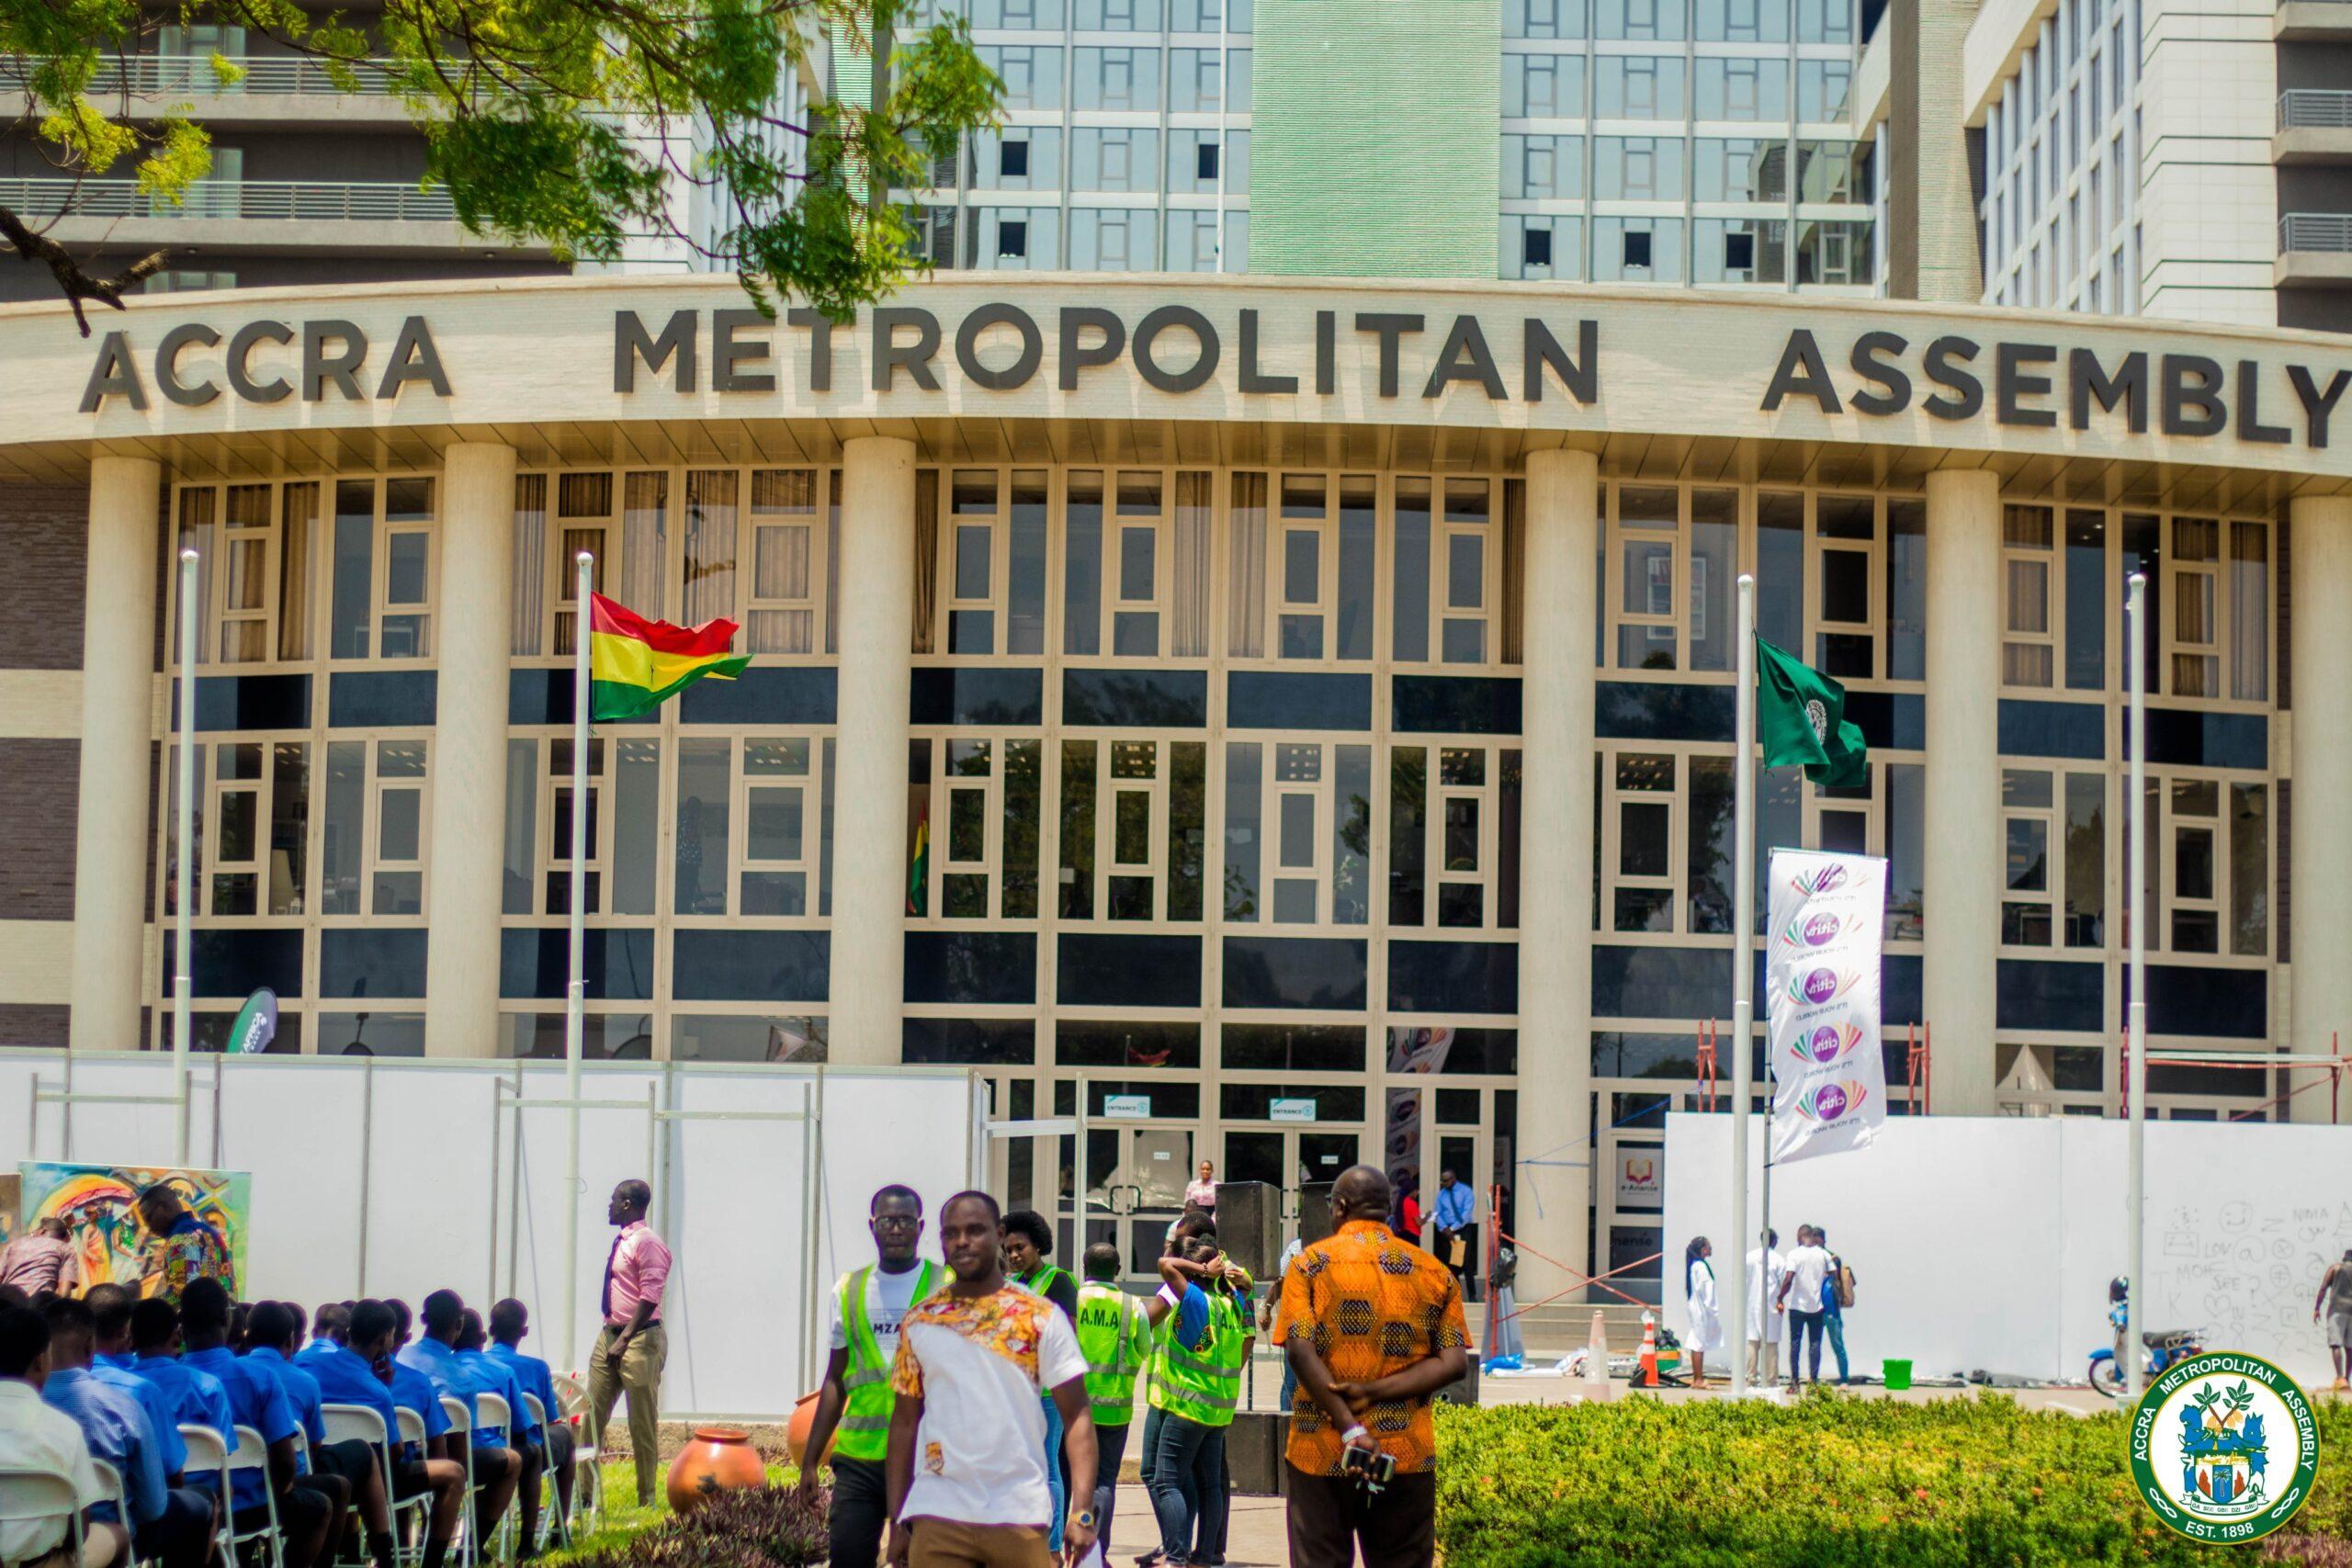 Accra Metropolitan Assembly